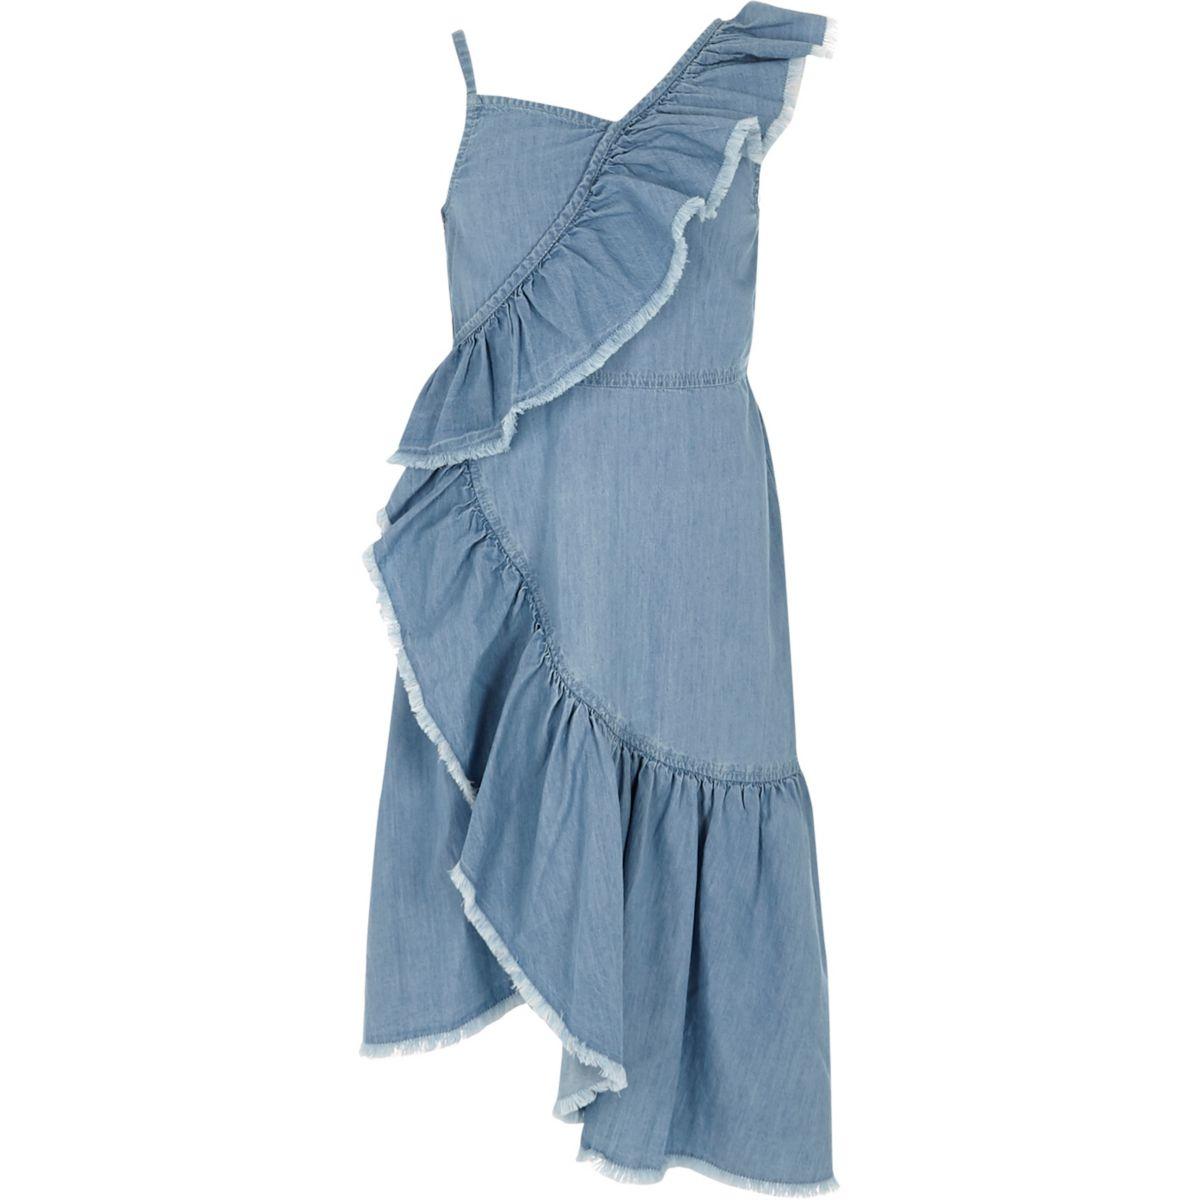 Girls light wash denim asymmetric frill dress